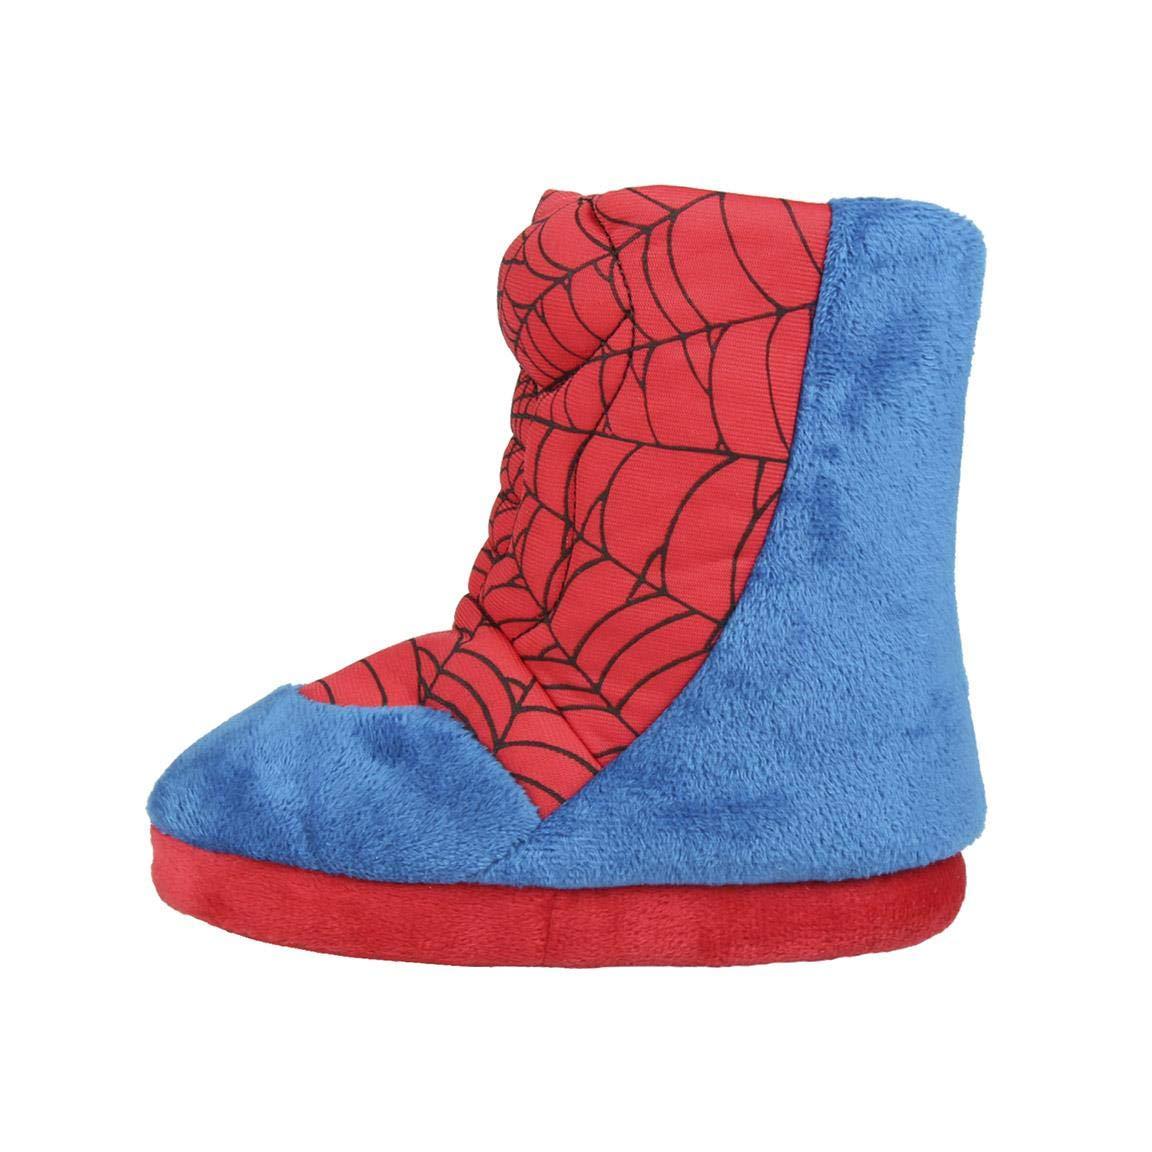 Supereroi Marvel Avengers Pantofole a Stivale Premium Scarpe da Casa DC Comics Justice League Imbottite Bambino Bambina Prodotto Originale 23-23XX